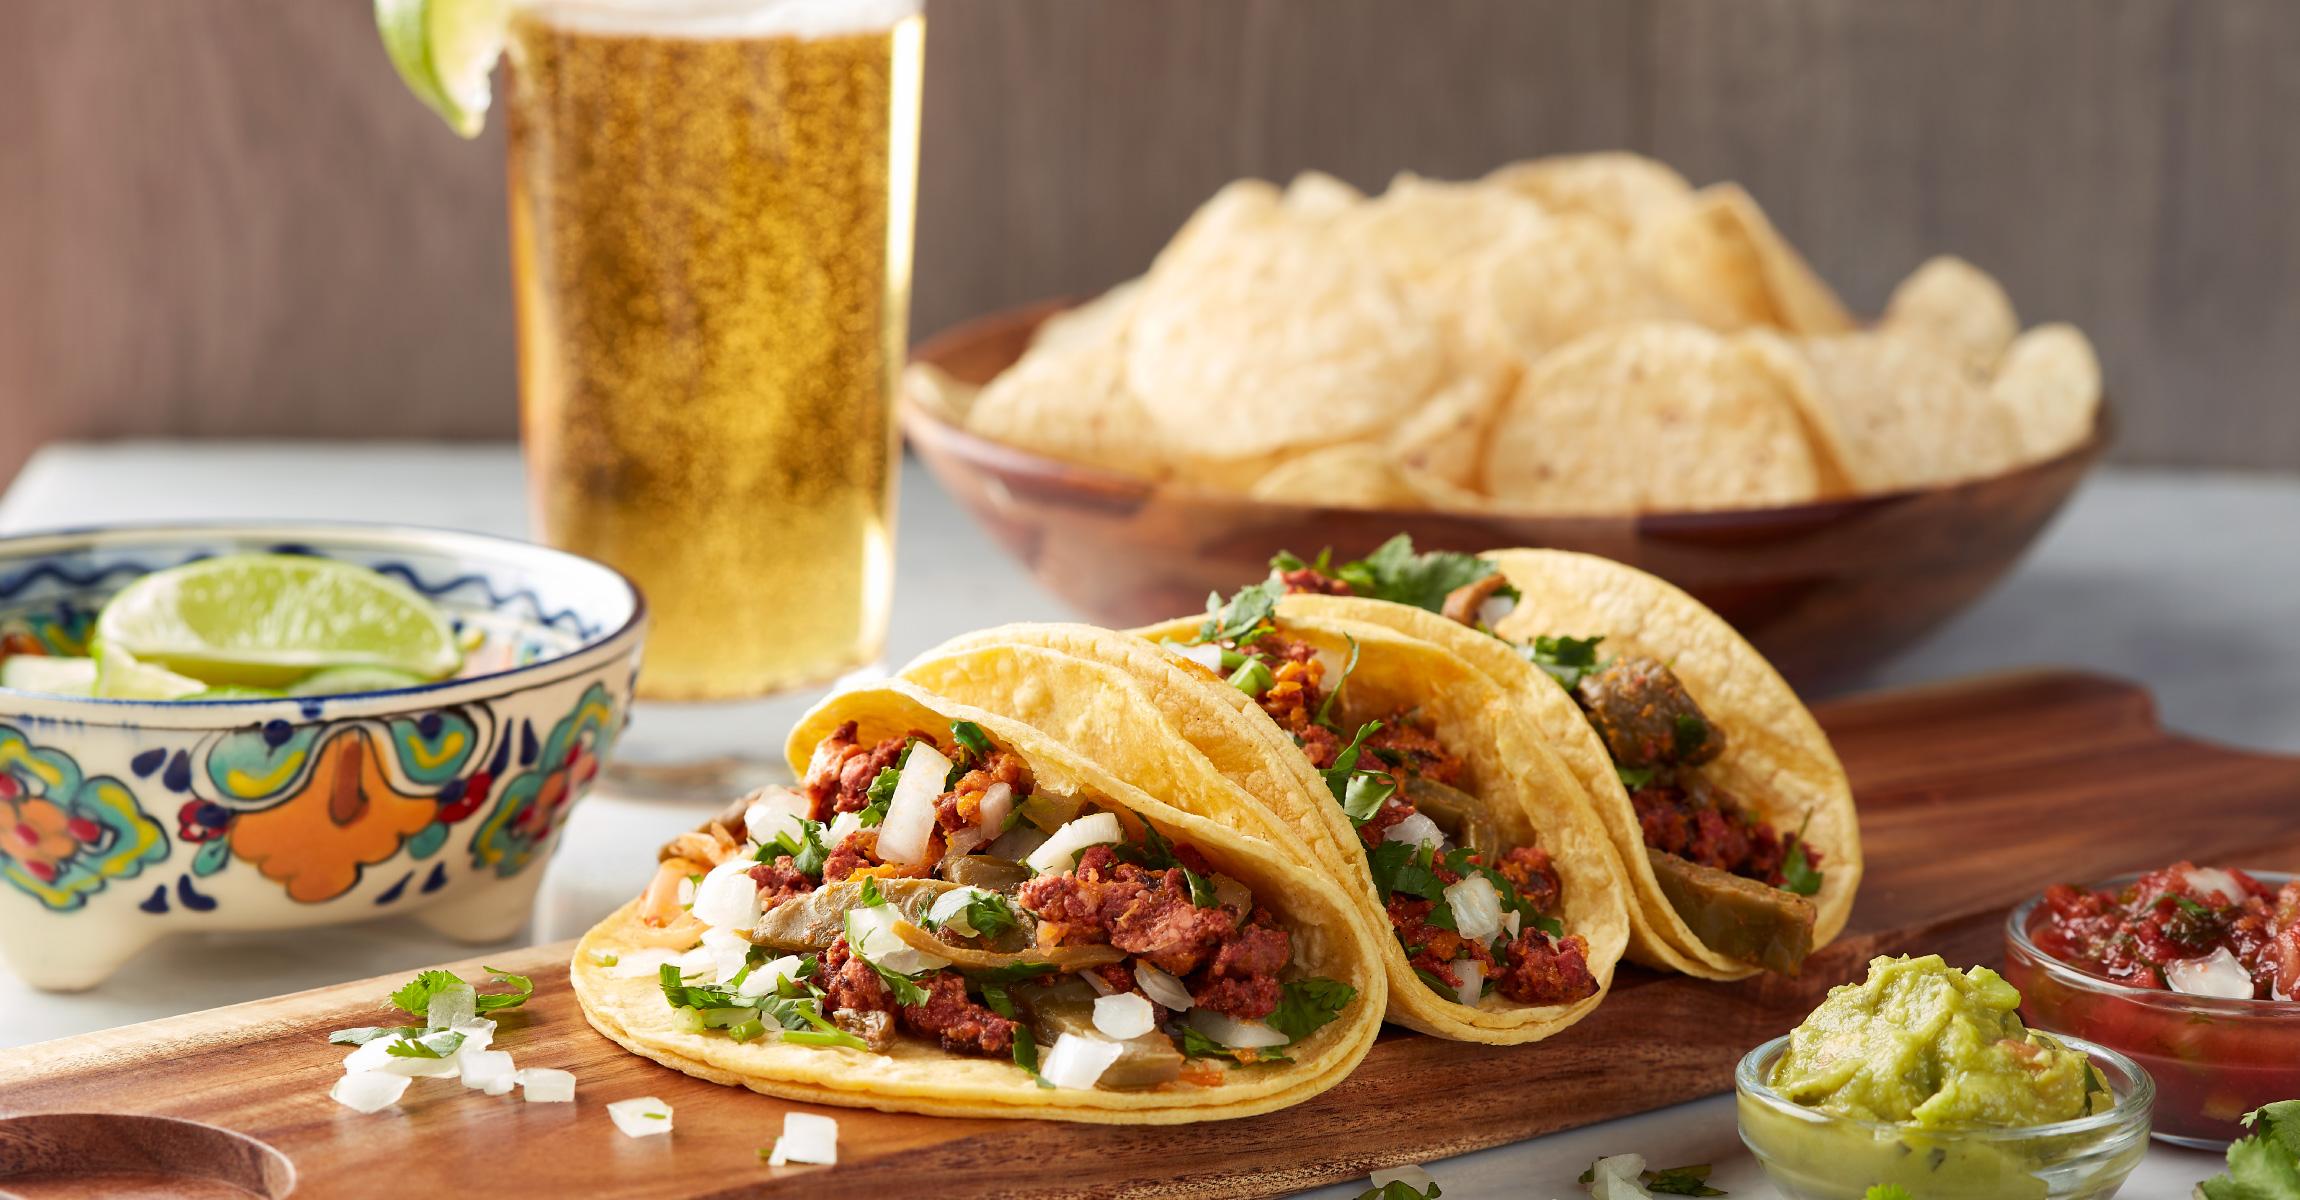 Lifeline tacos